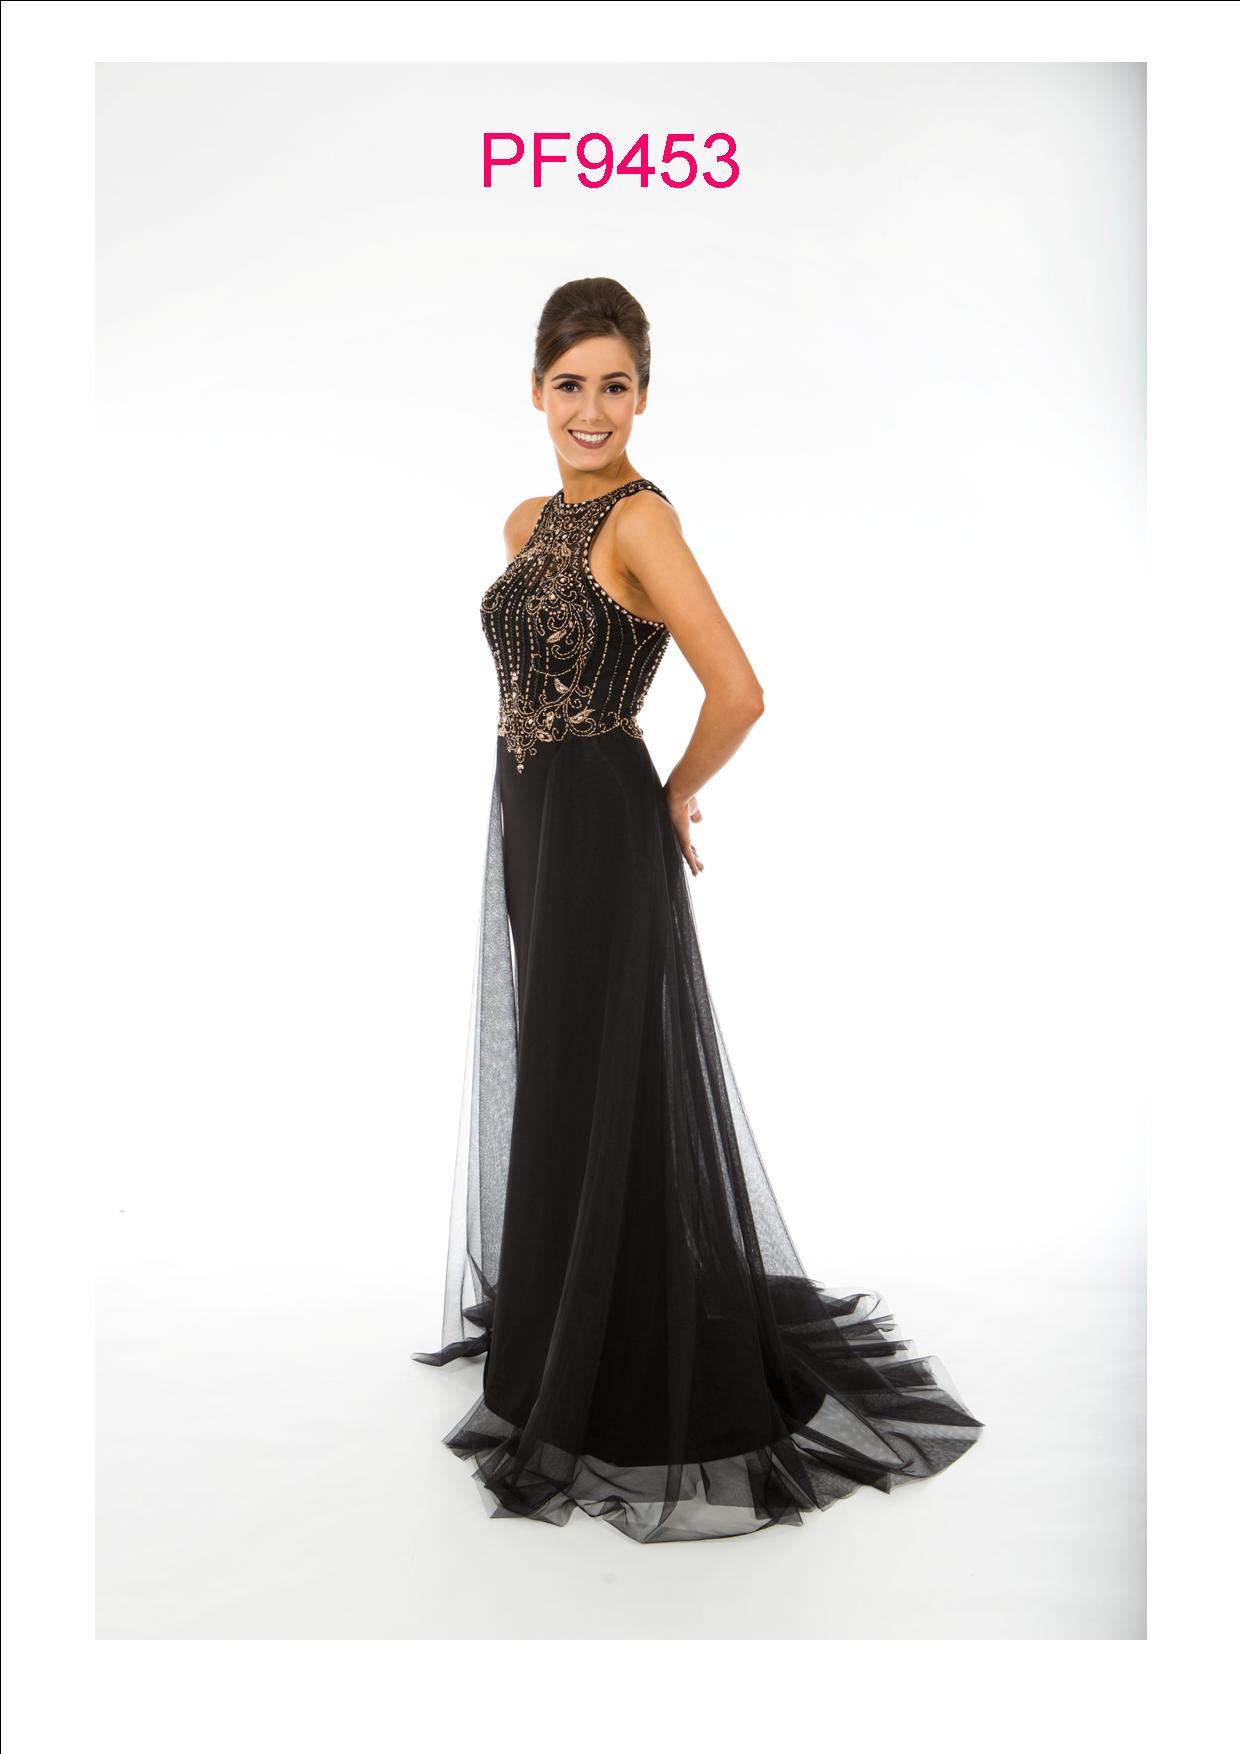 ac6dc70cb22 Black And Gold Prom Dresses Cheap